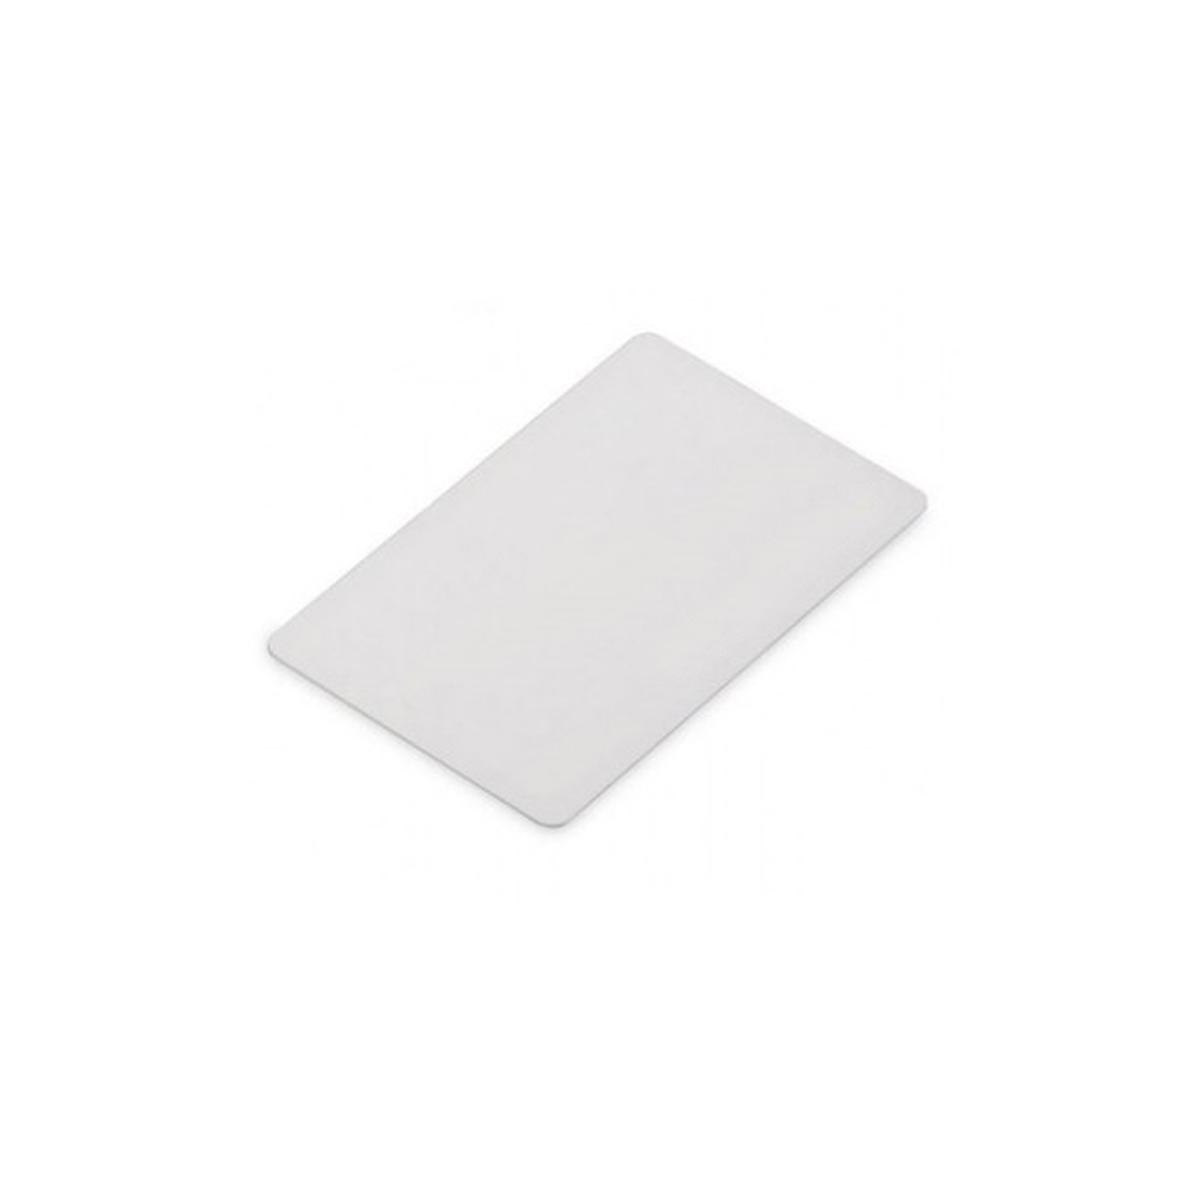 Tarjeta RFID 13,56 mHz